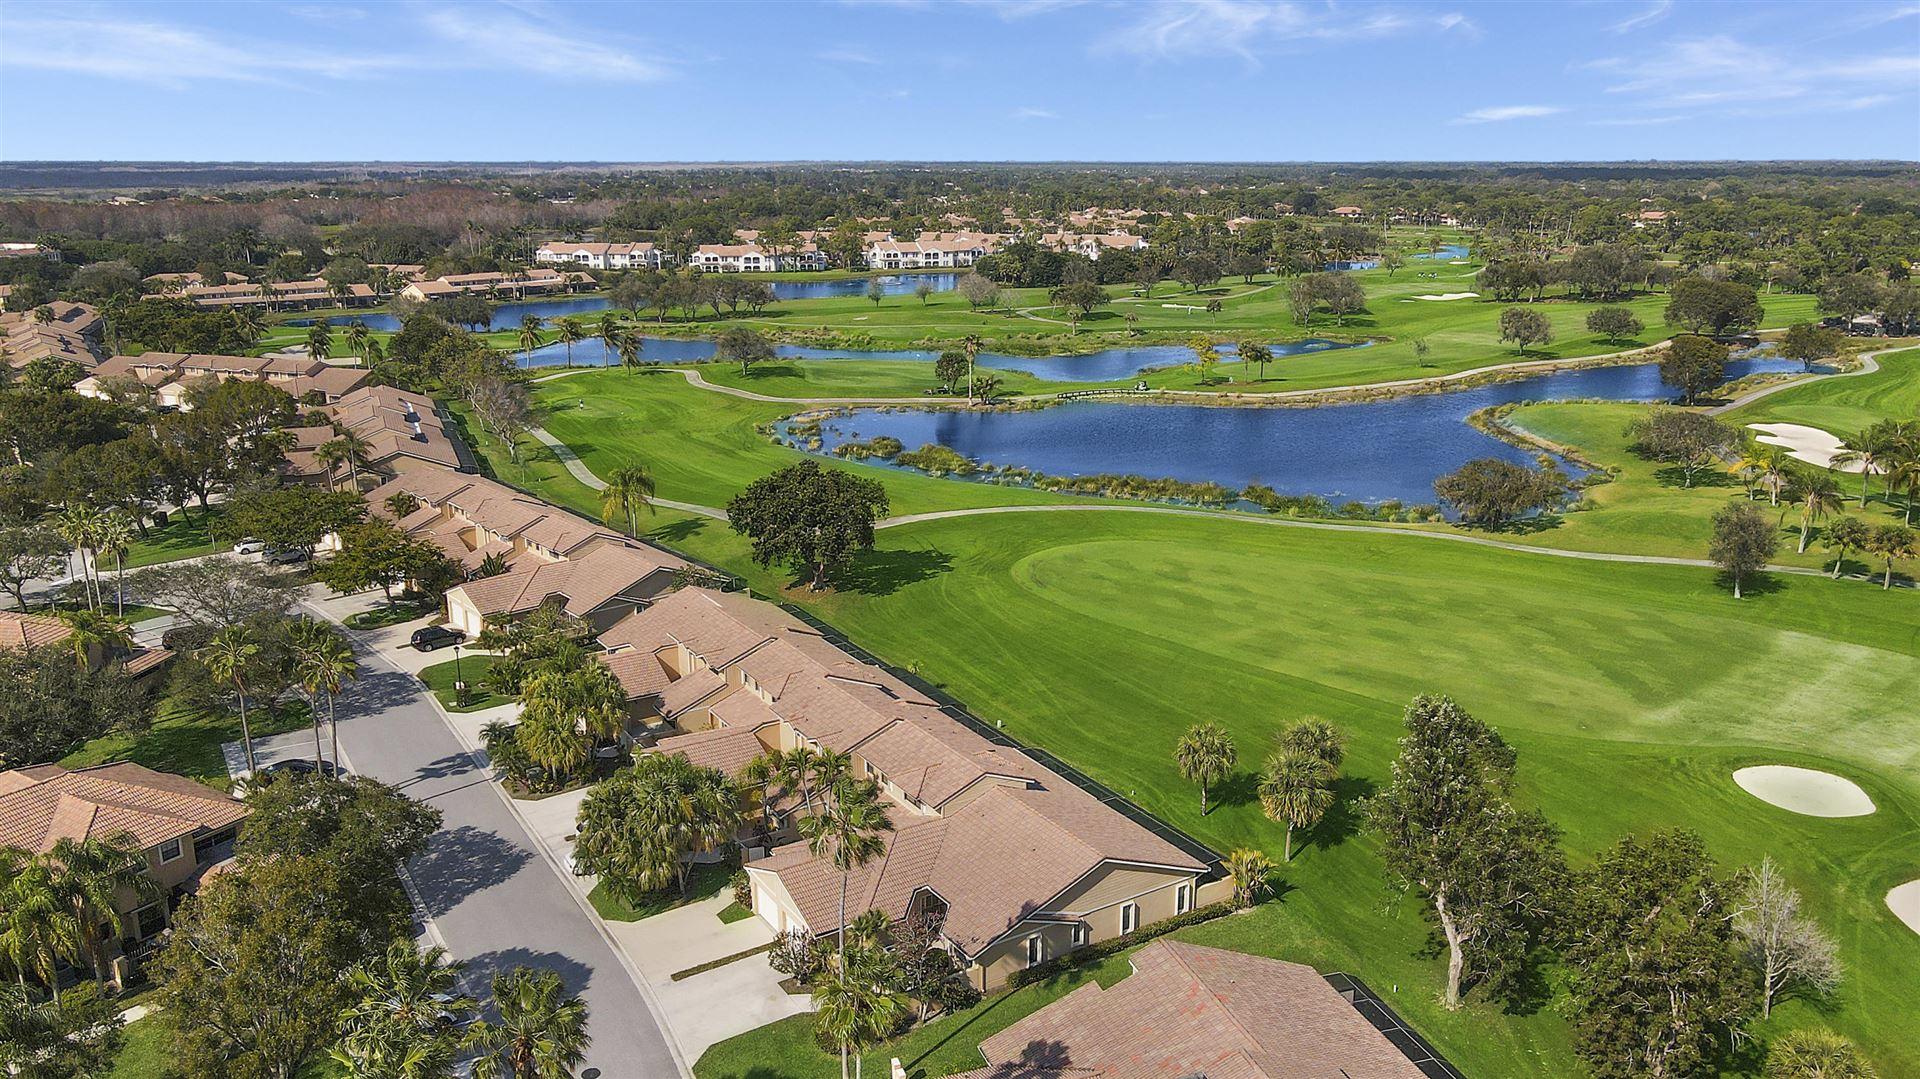 507 Prestwick Circle, Palm Beach Gardens, FL 33418 - #: RX-10688679